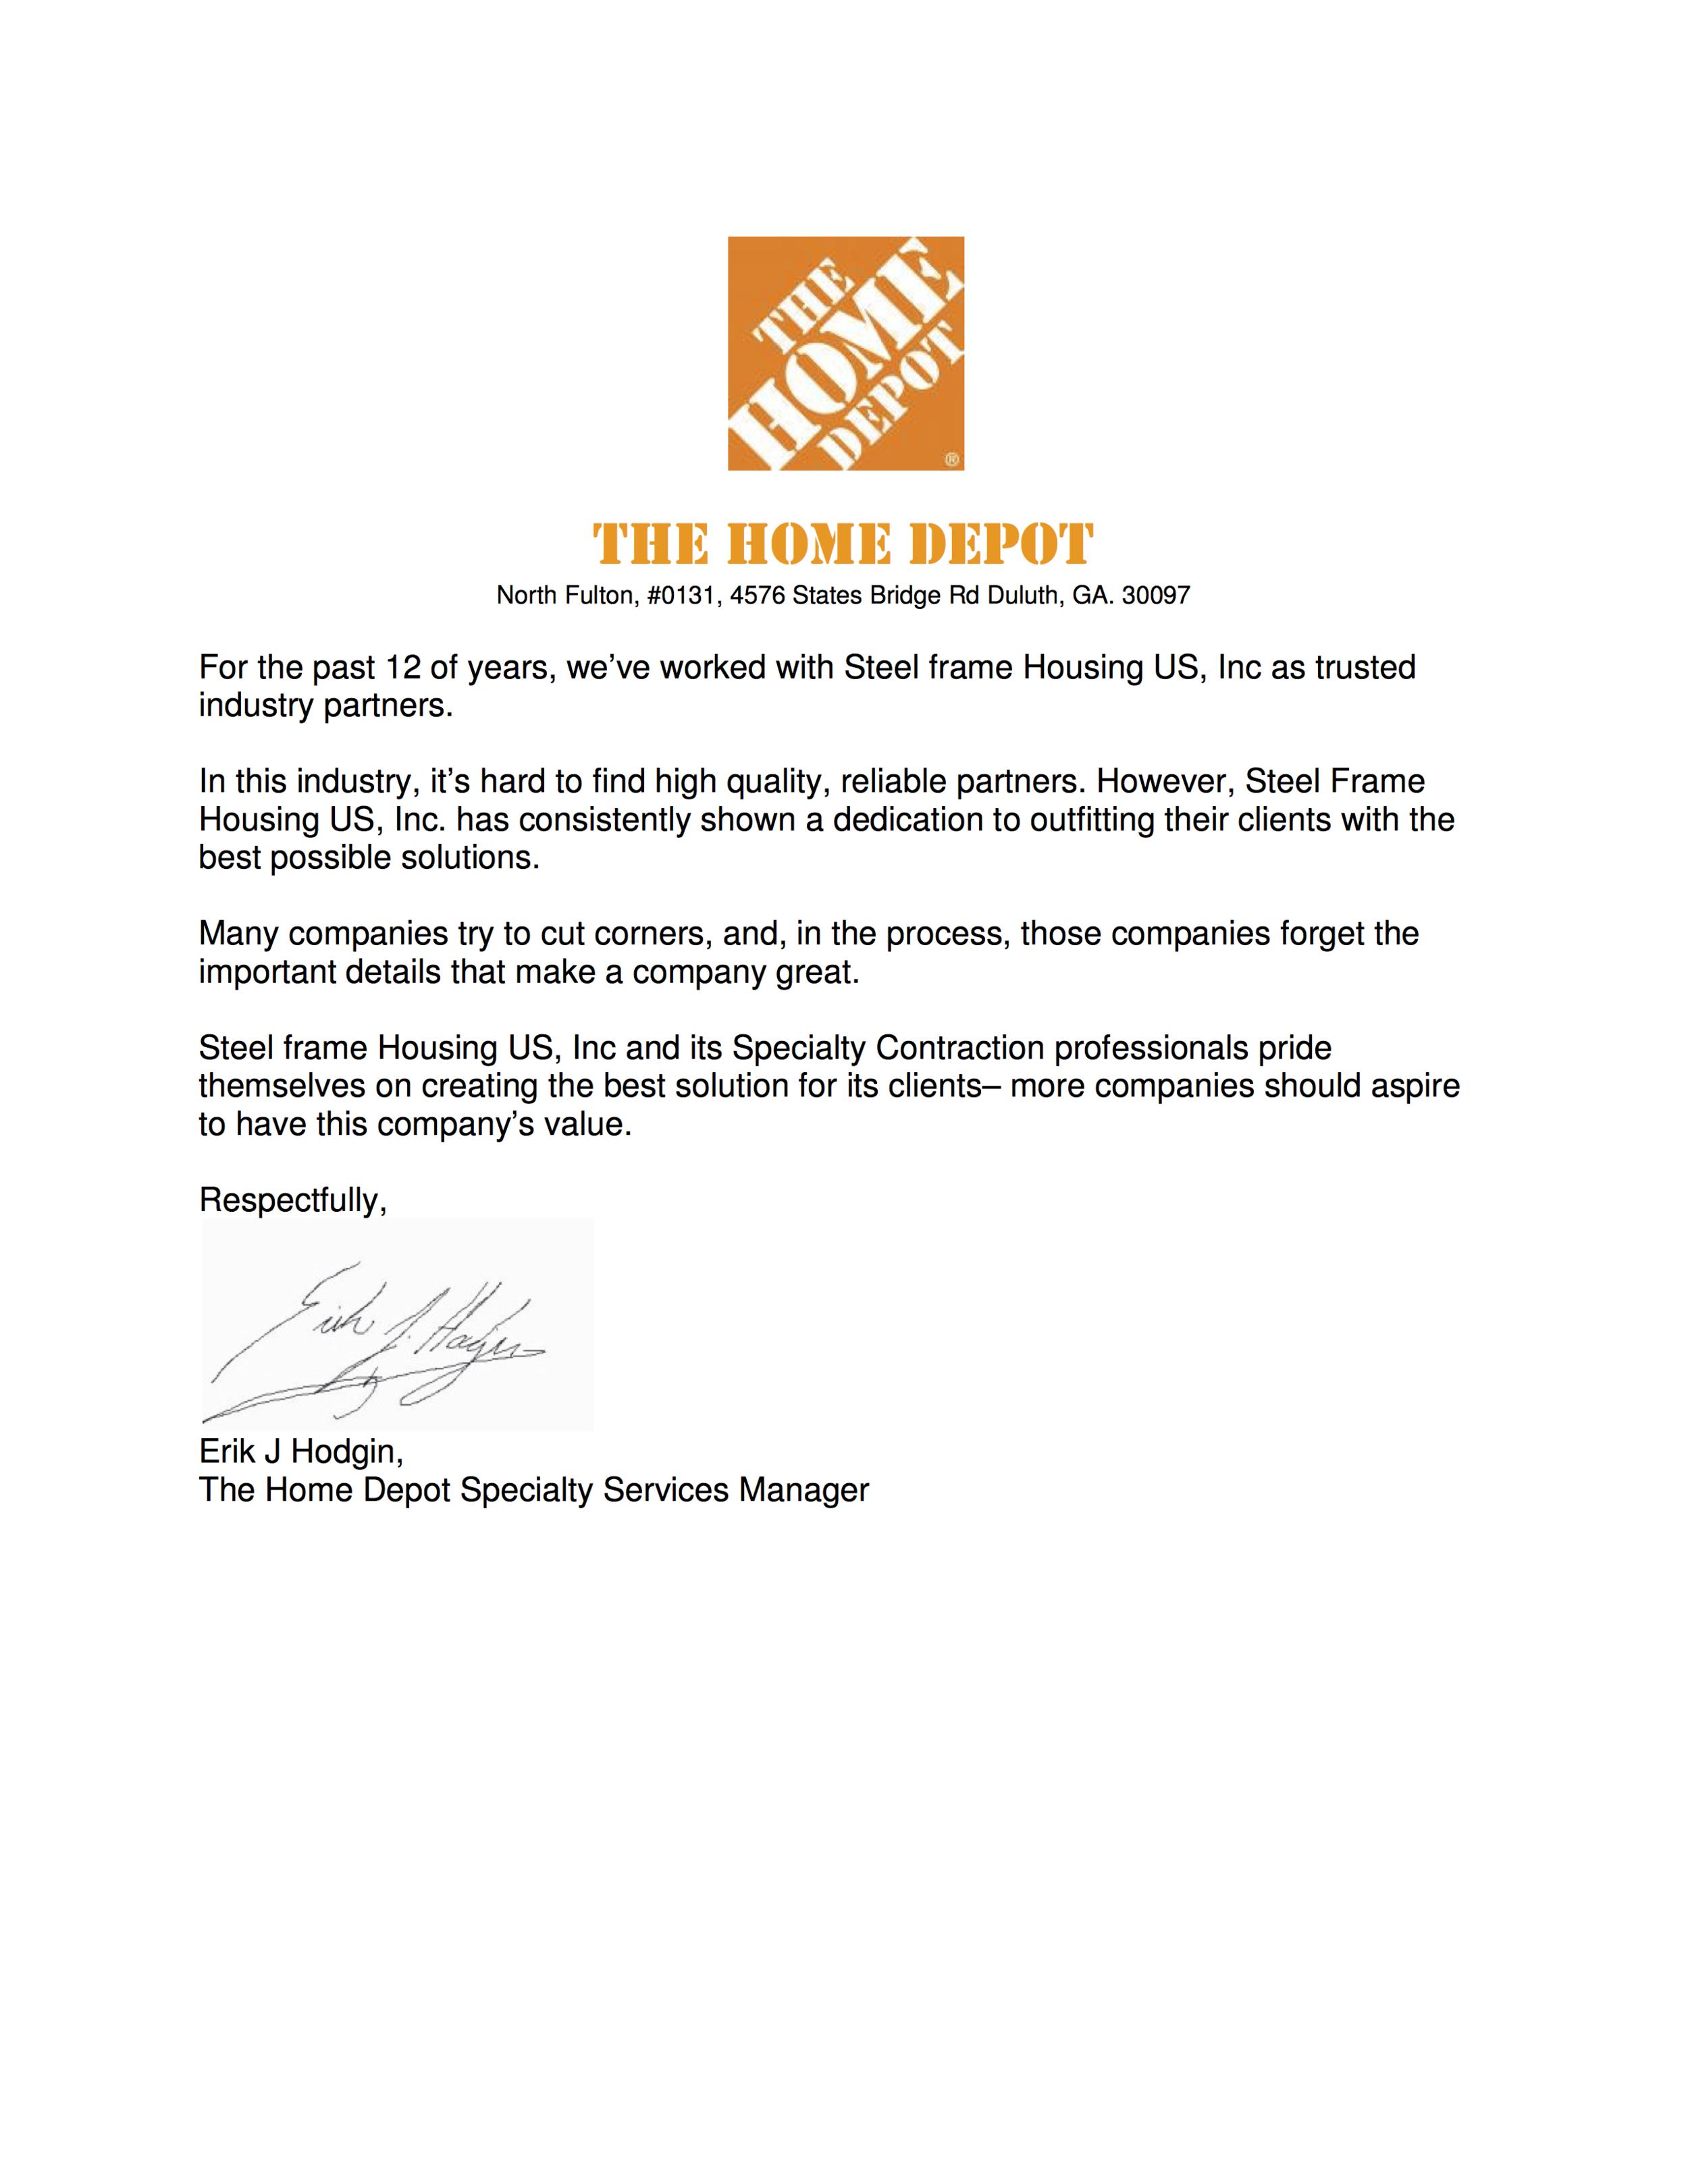 Home depot letter.png